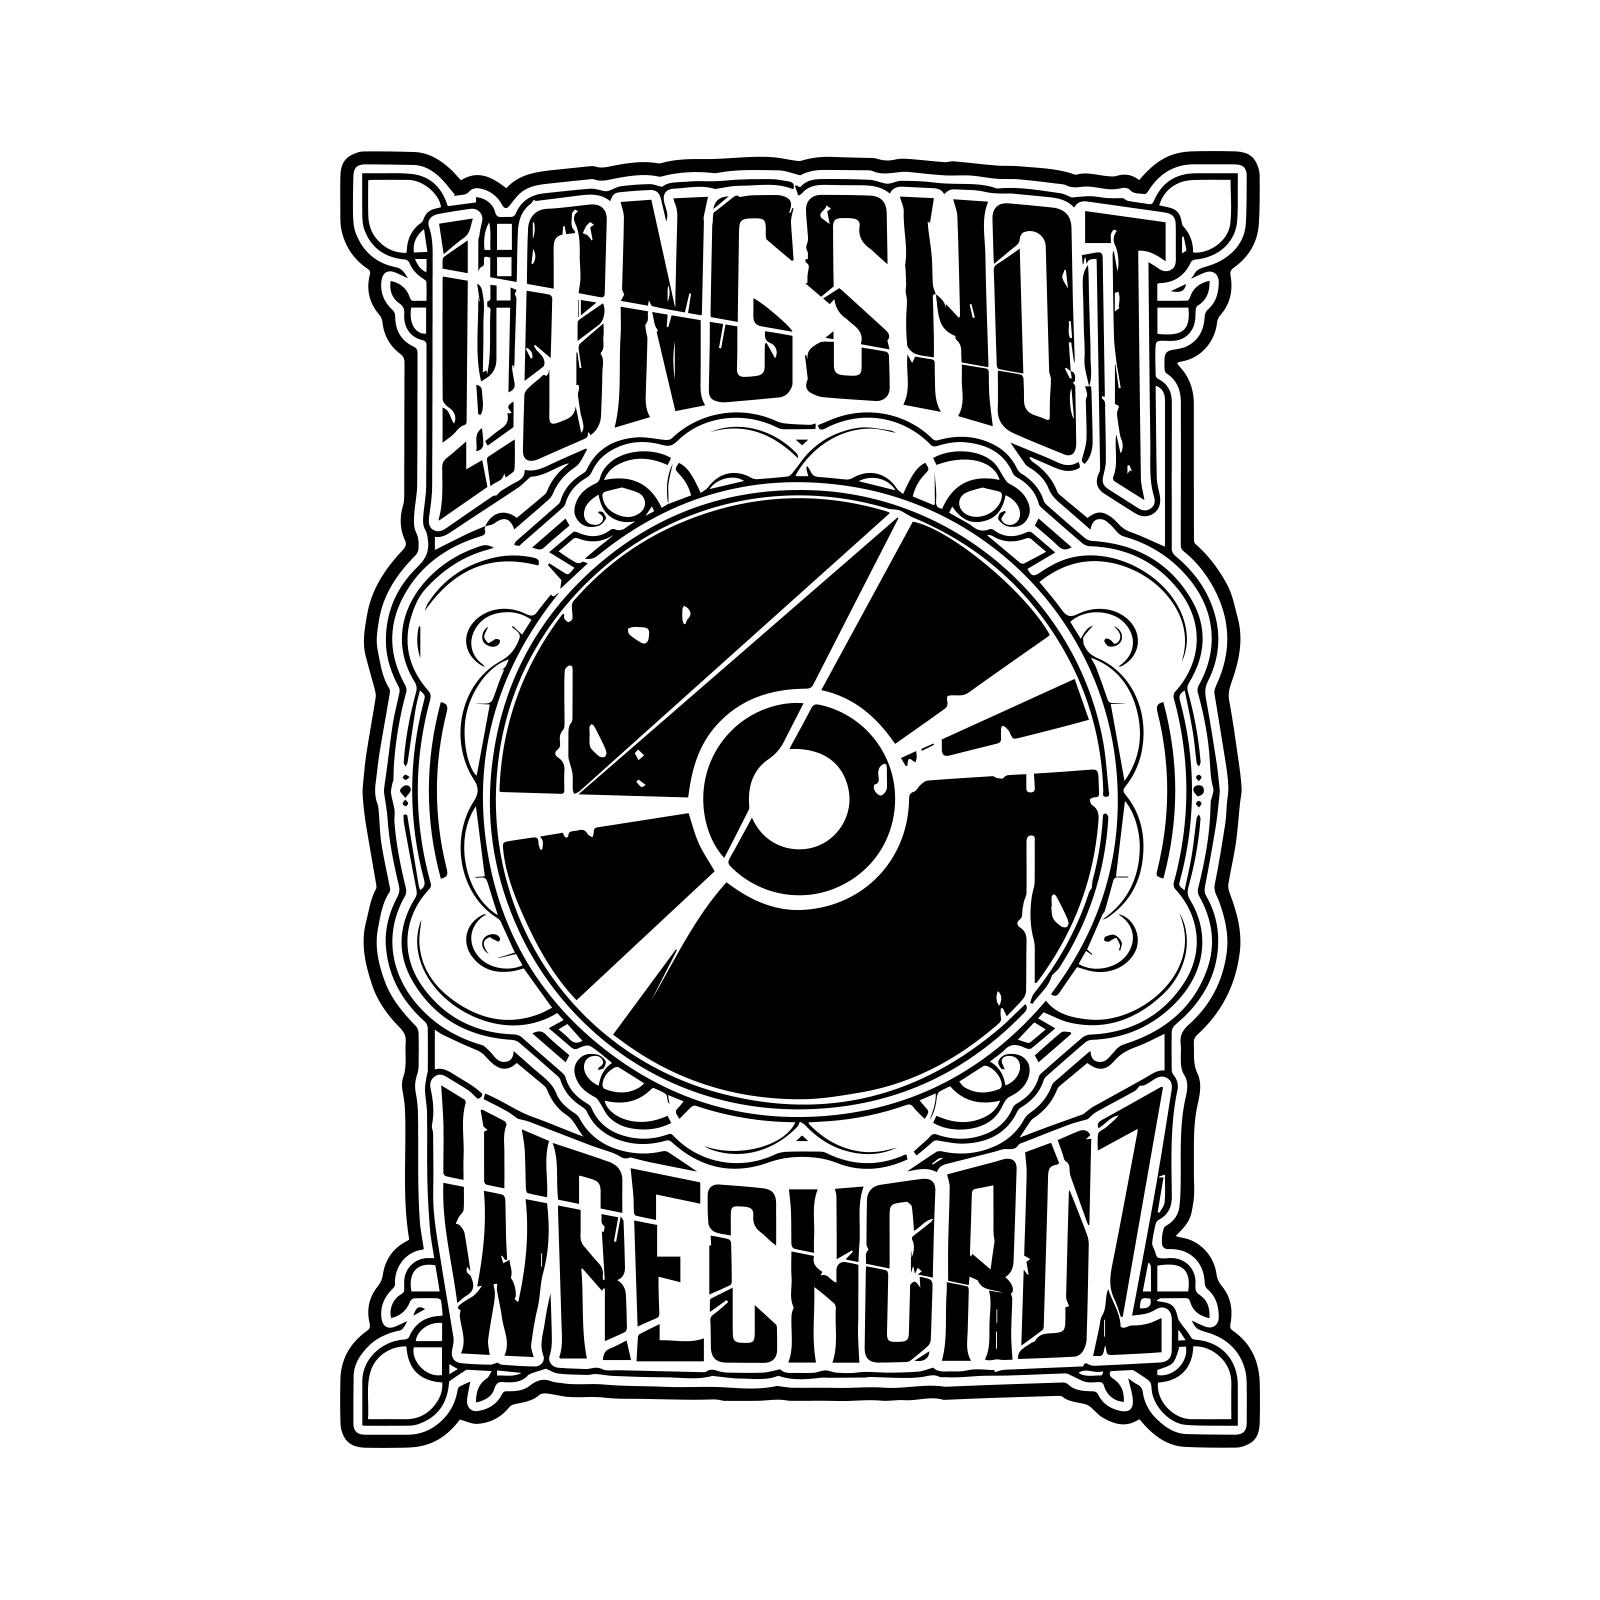 LongShot Wrechordz logo fin